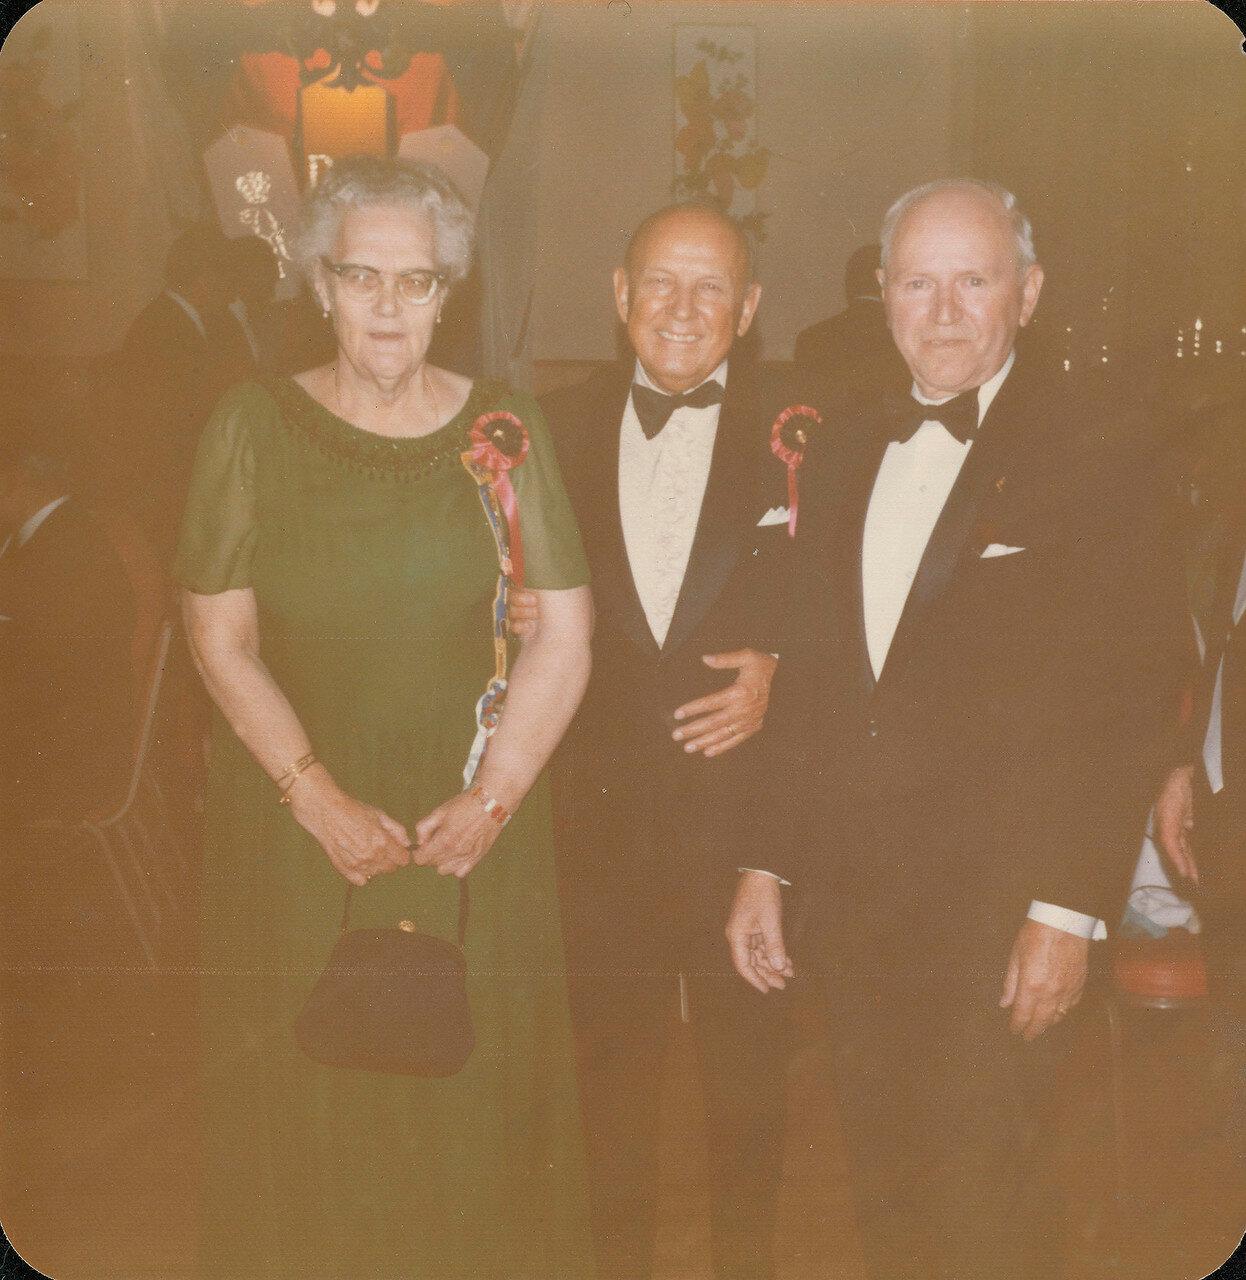 1974. Княгиня Вера Константиновна с двумя джентльменами на обеде в Нью-Йорке